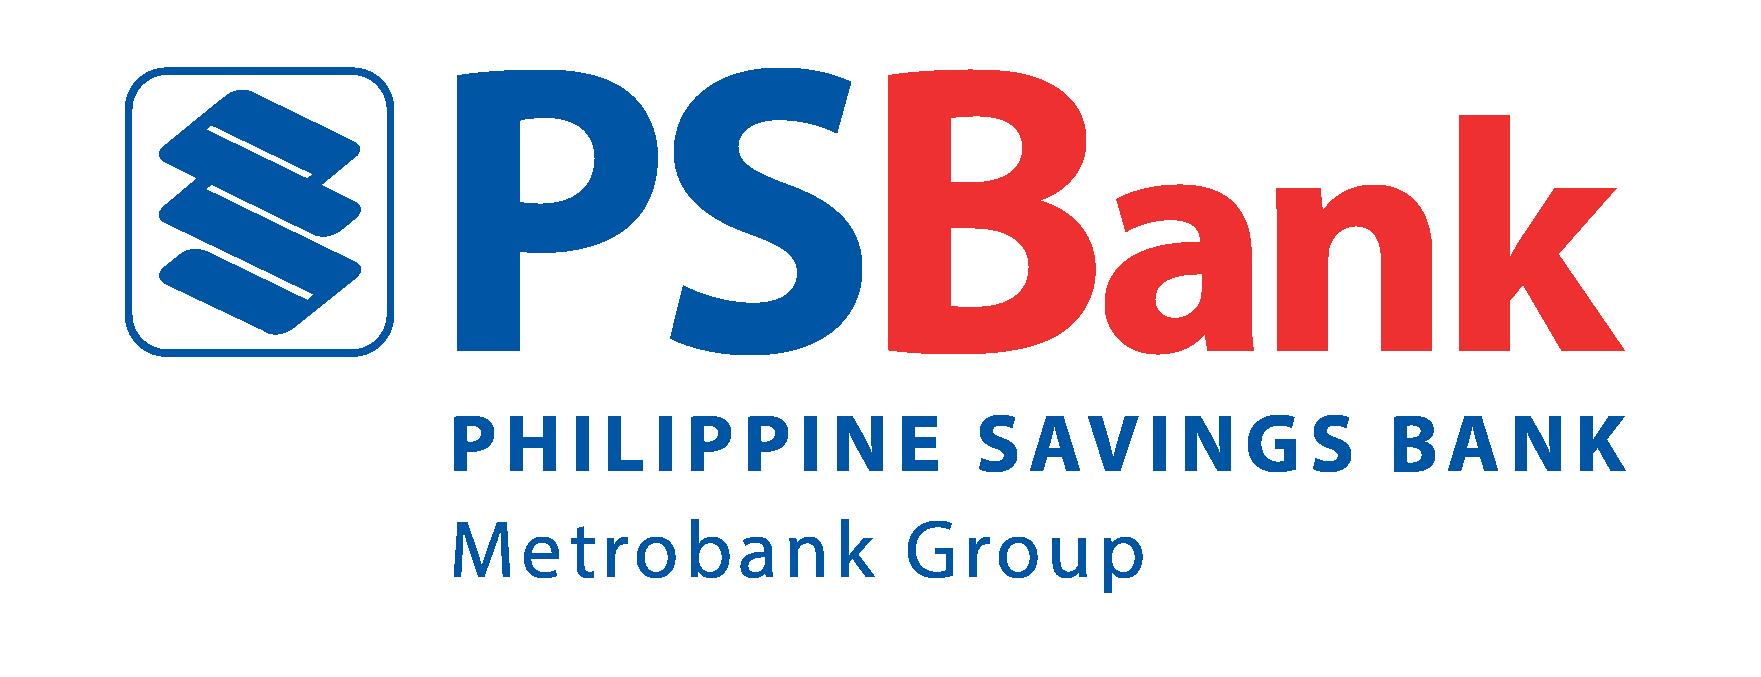 Phiippine Savings Bank (PSBank)